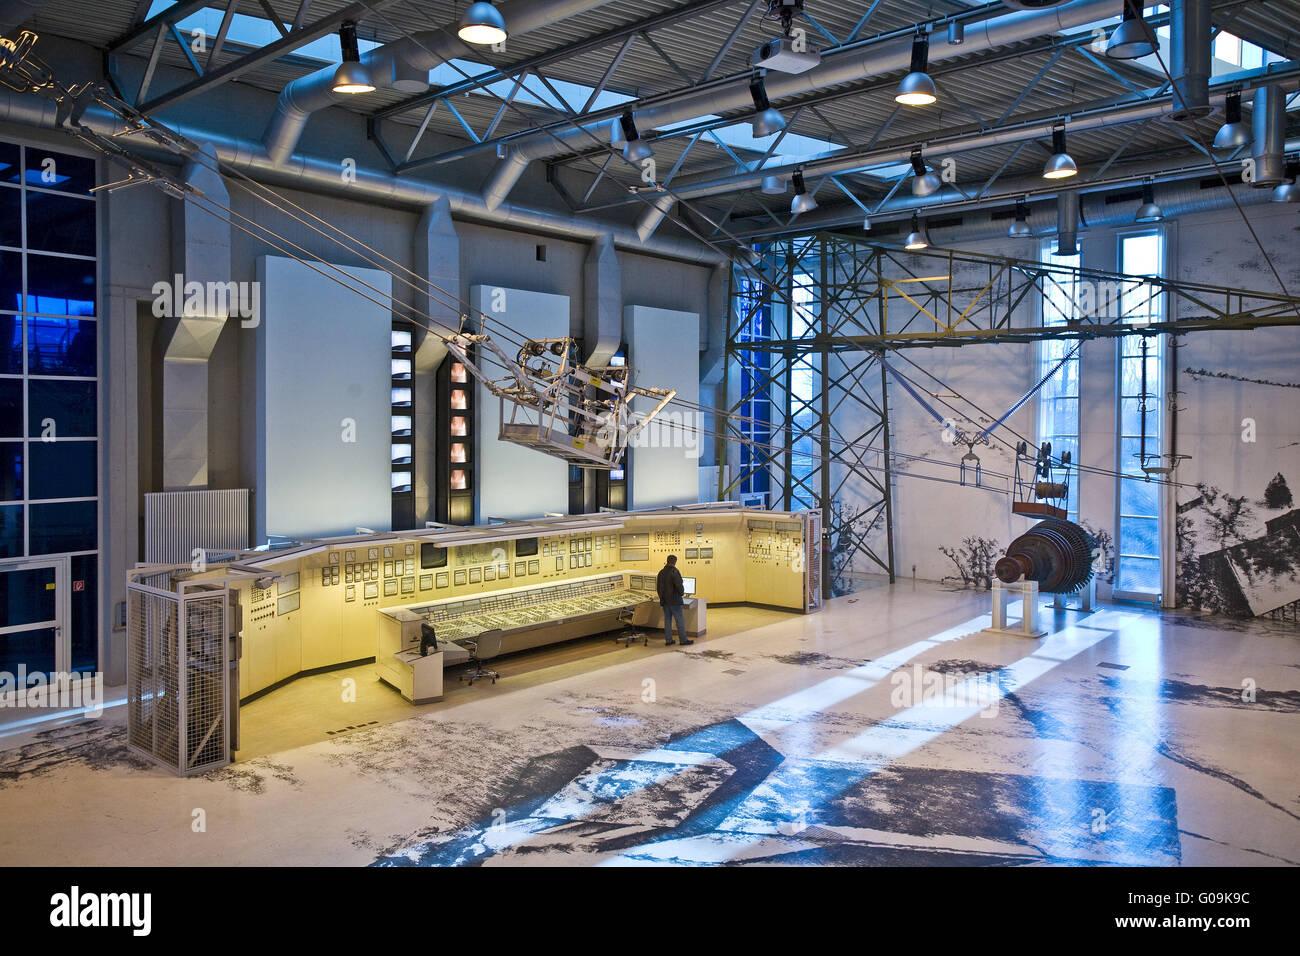 DASA, Working World Exhibition, Dortmund, Germany. Stock Photo